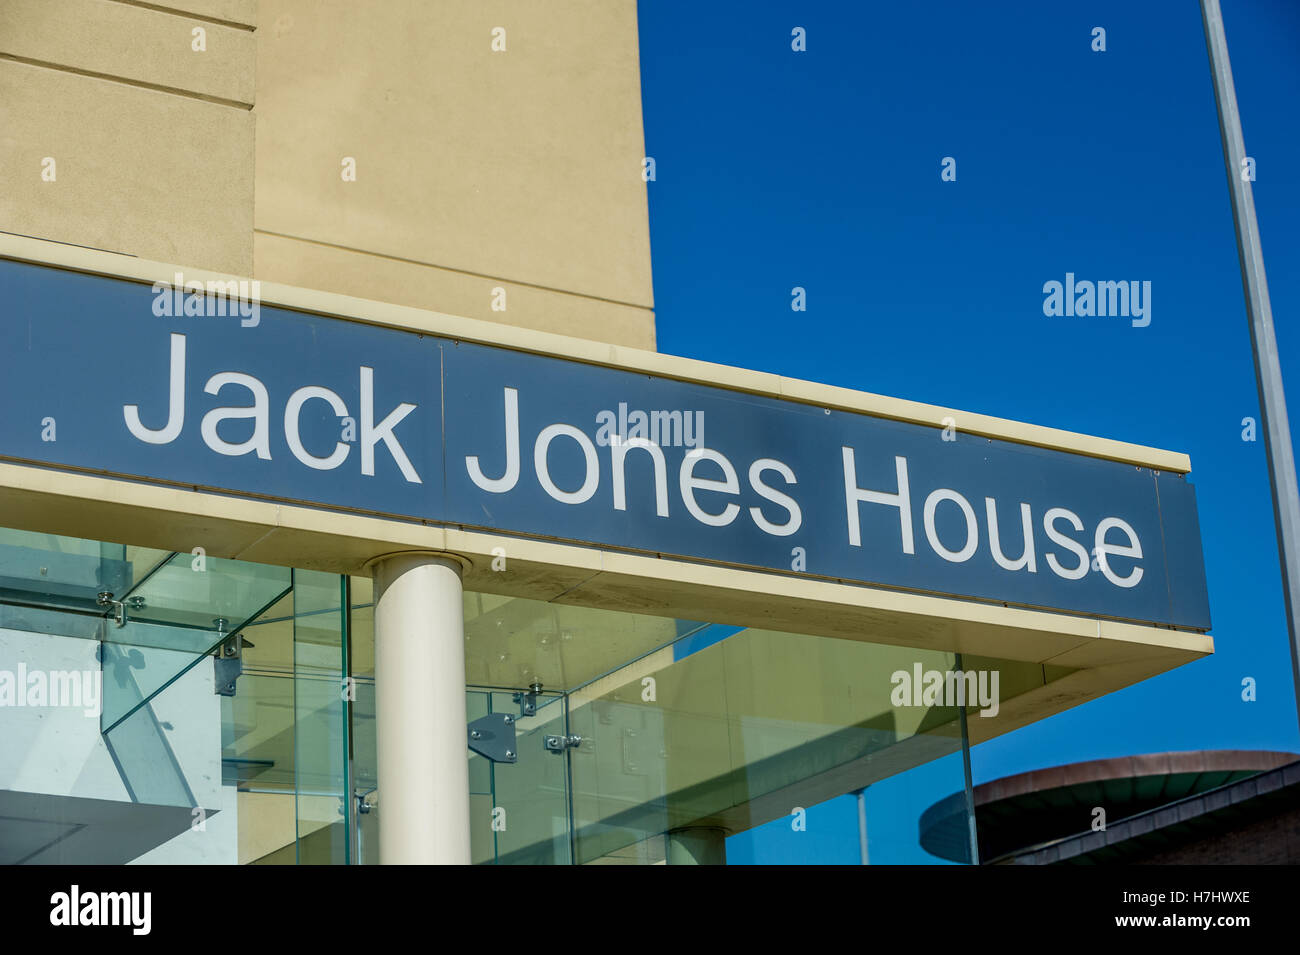 Jack Jones House, regional HQ for Unite the Union, Liverpool - Stock Image